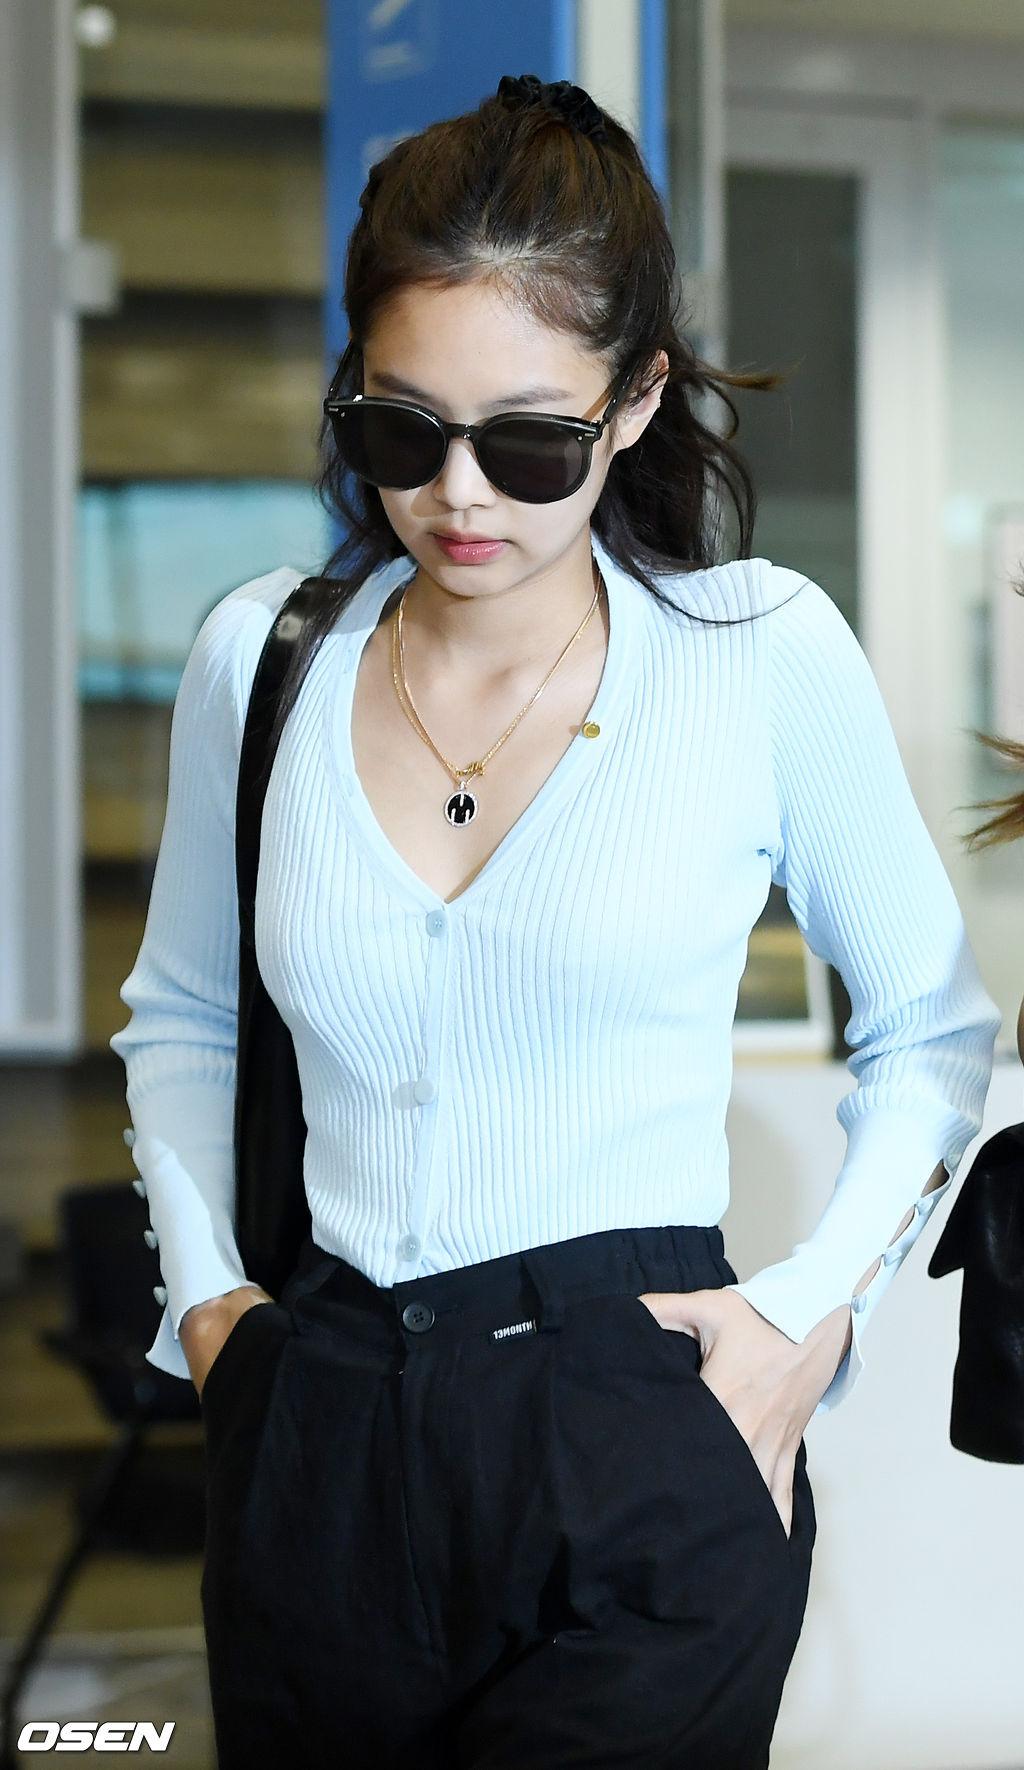 jennie airport luxurious beauty 3